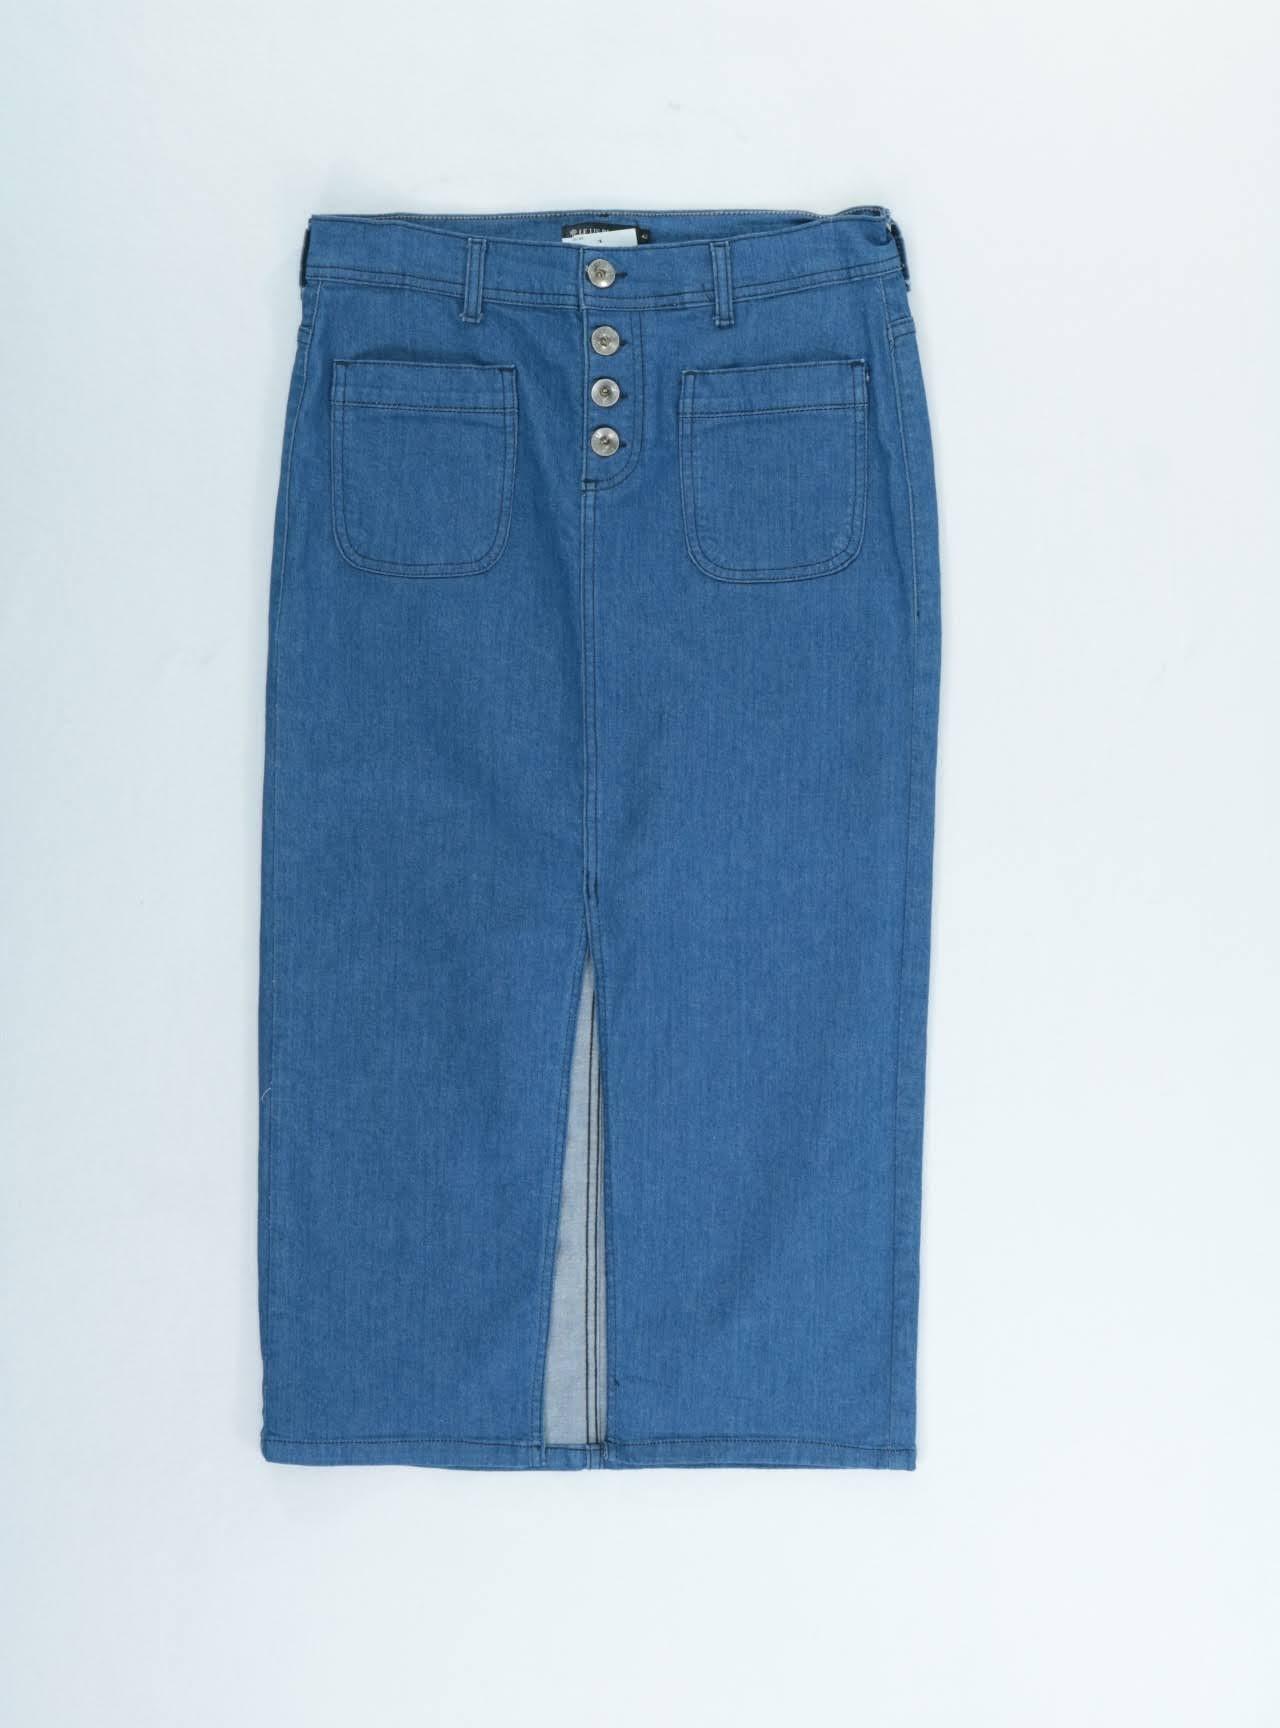 Saia Jeans - Le Lis Blanc - 42